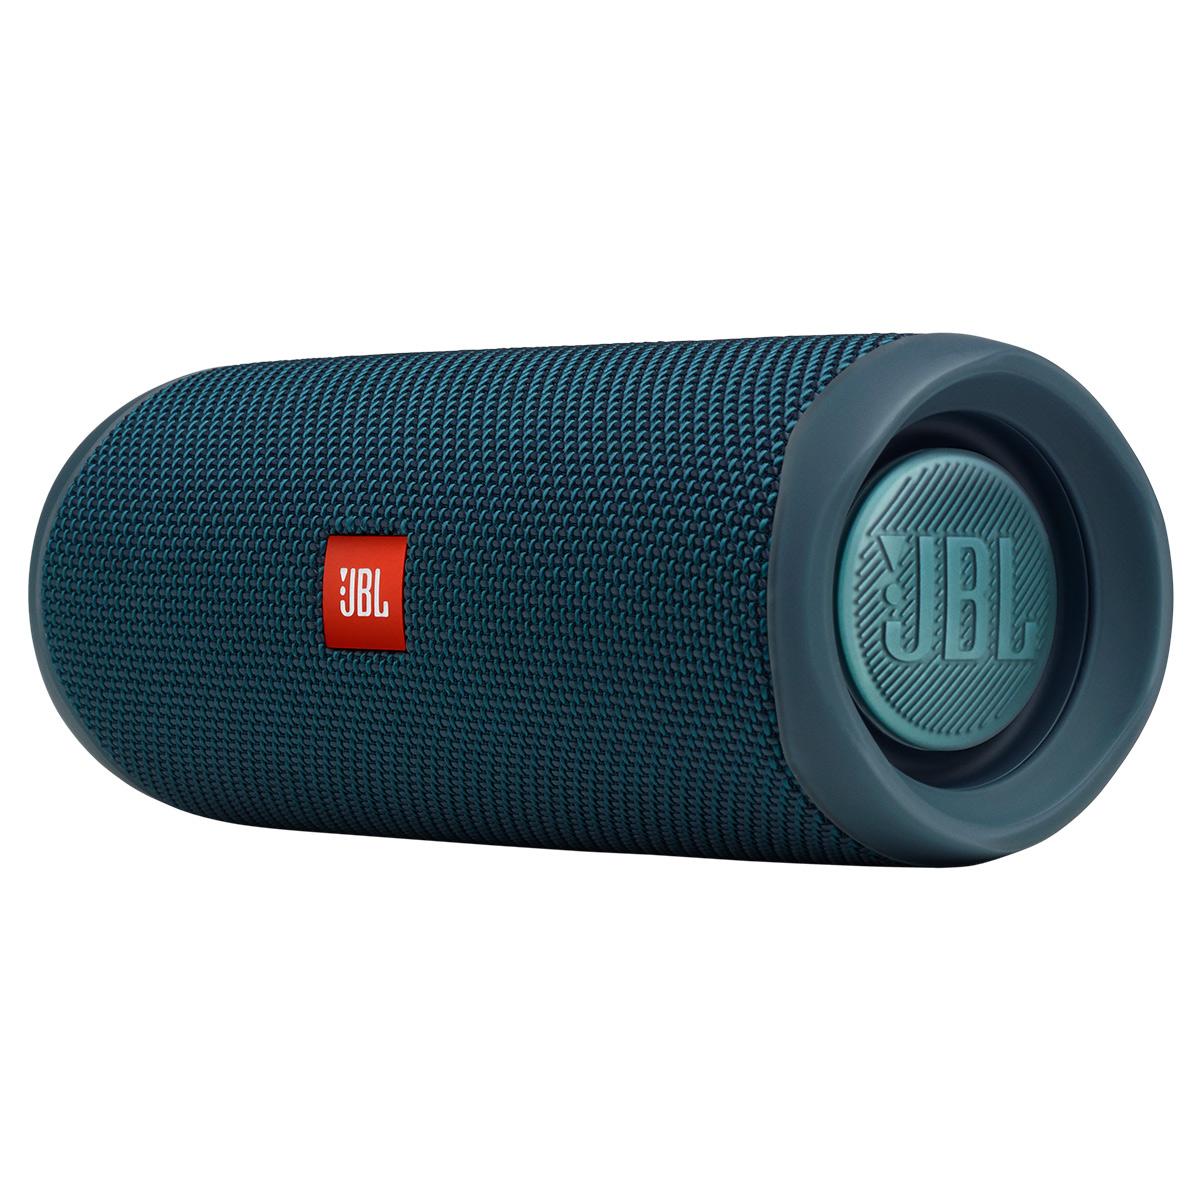 JBL-Flip-5-Portable-Waterproof-Bluetooth-Speaker thumbnail 12